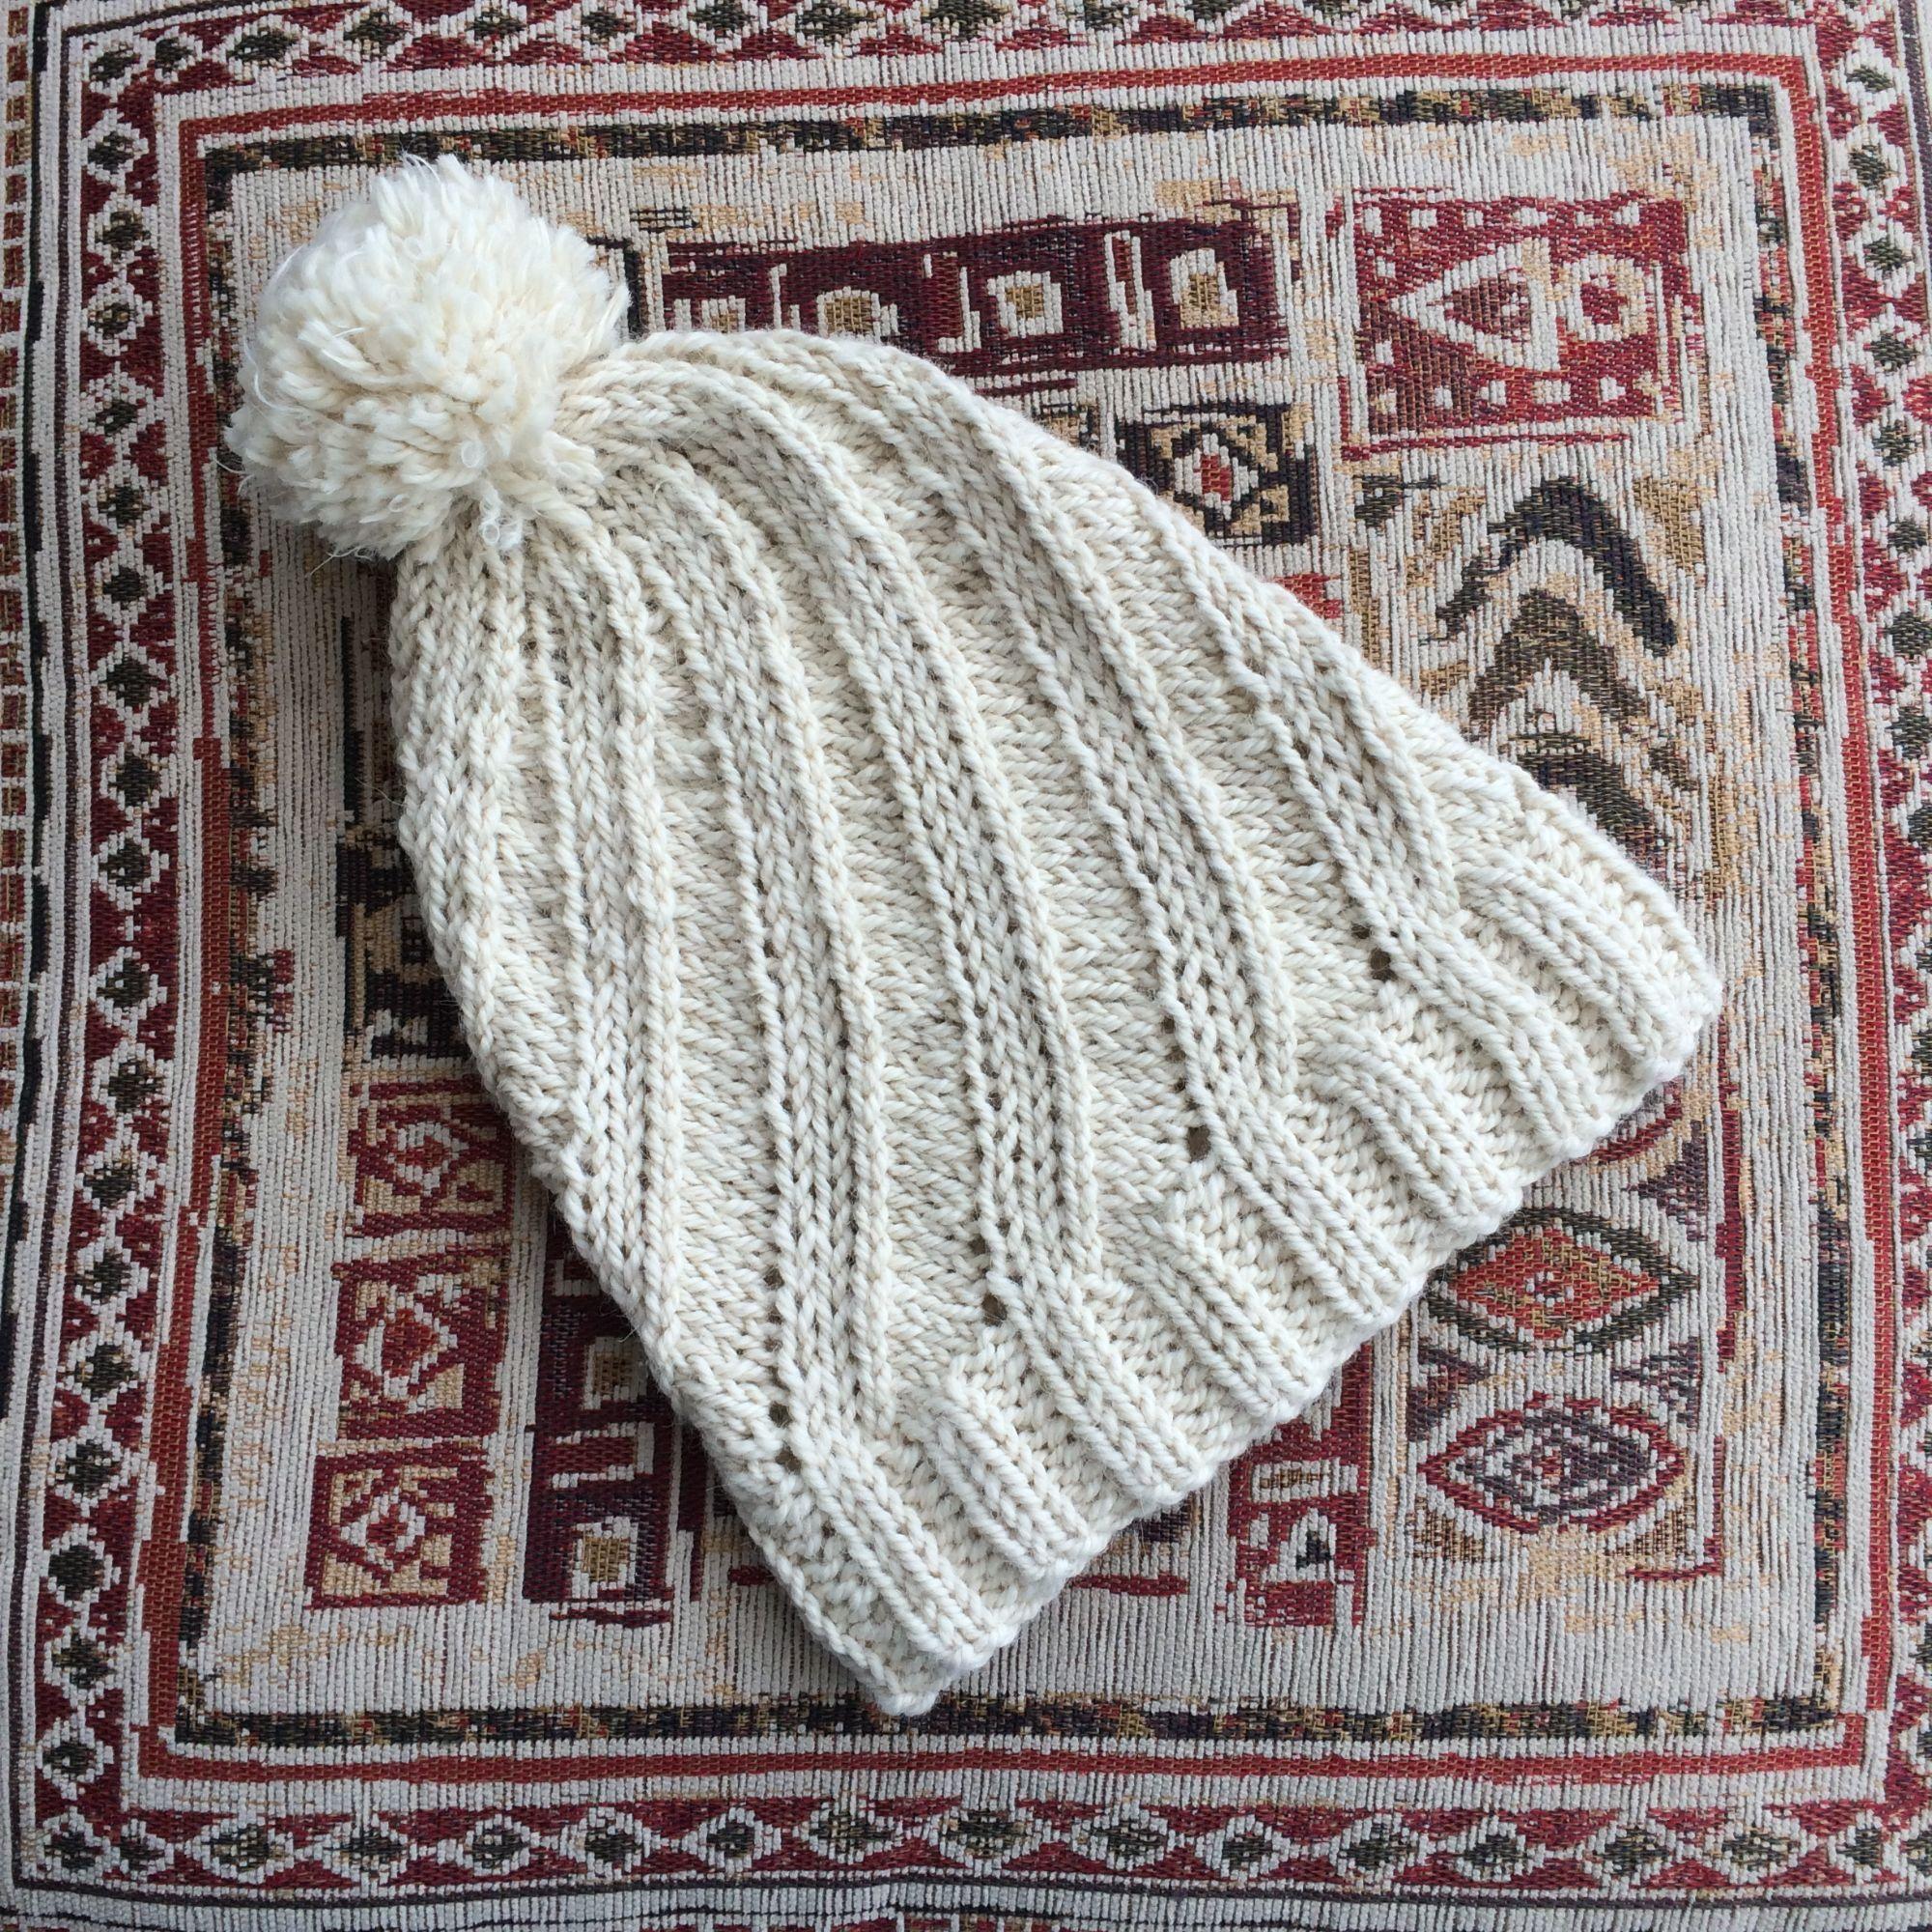 Abbotts hat kit